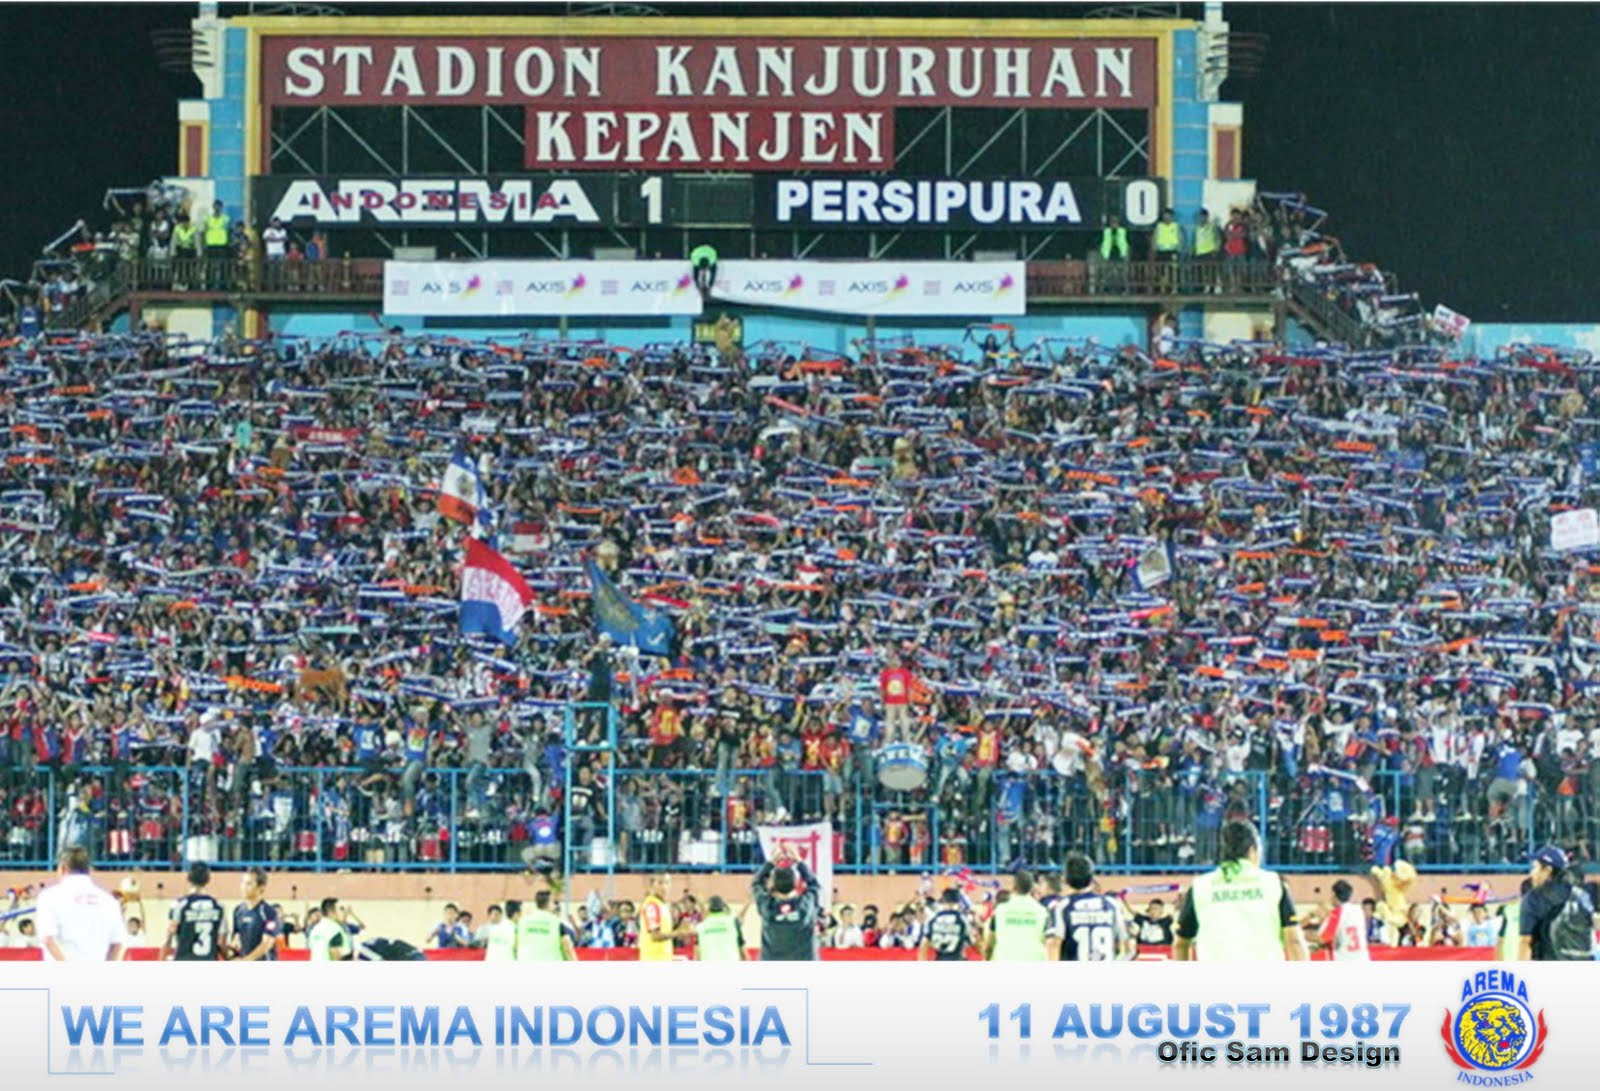 http://3.bp.blogspot.com/-43uKsexif2s/Tb-M6QgCJnI/AAAAAAAAAKg/rsF3XWwyslY/s1600/wallpaper+arema+indonesia+mei+2011+by+ofic+sam+_boy_gassipers@yahoo.co.id+%2821%29.jpg